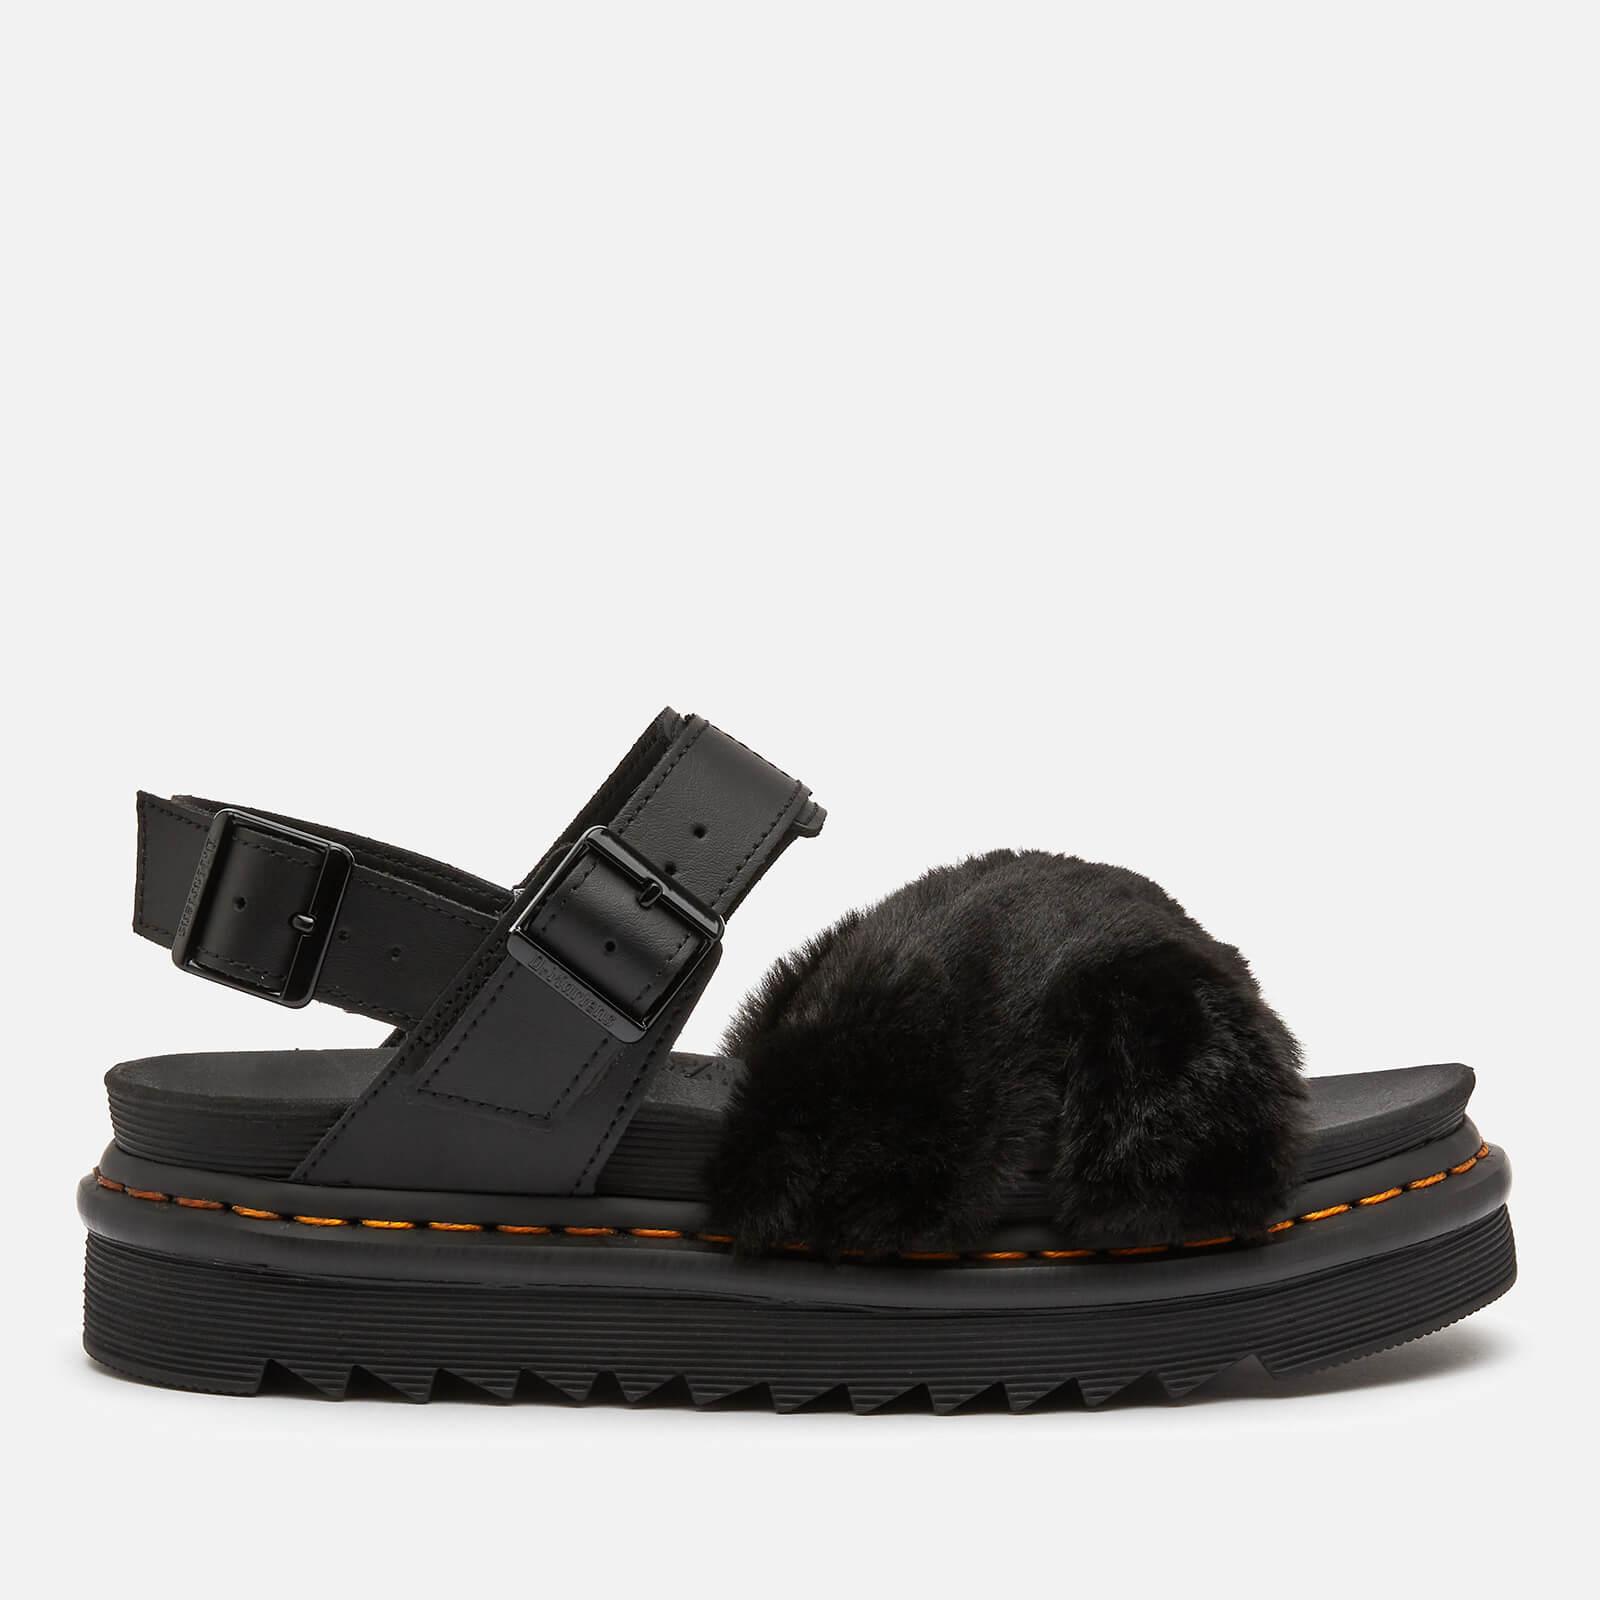 Dr. Martens Women's Voss Ii Fluffy Sandals - Black - UK 3